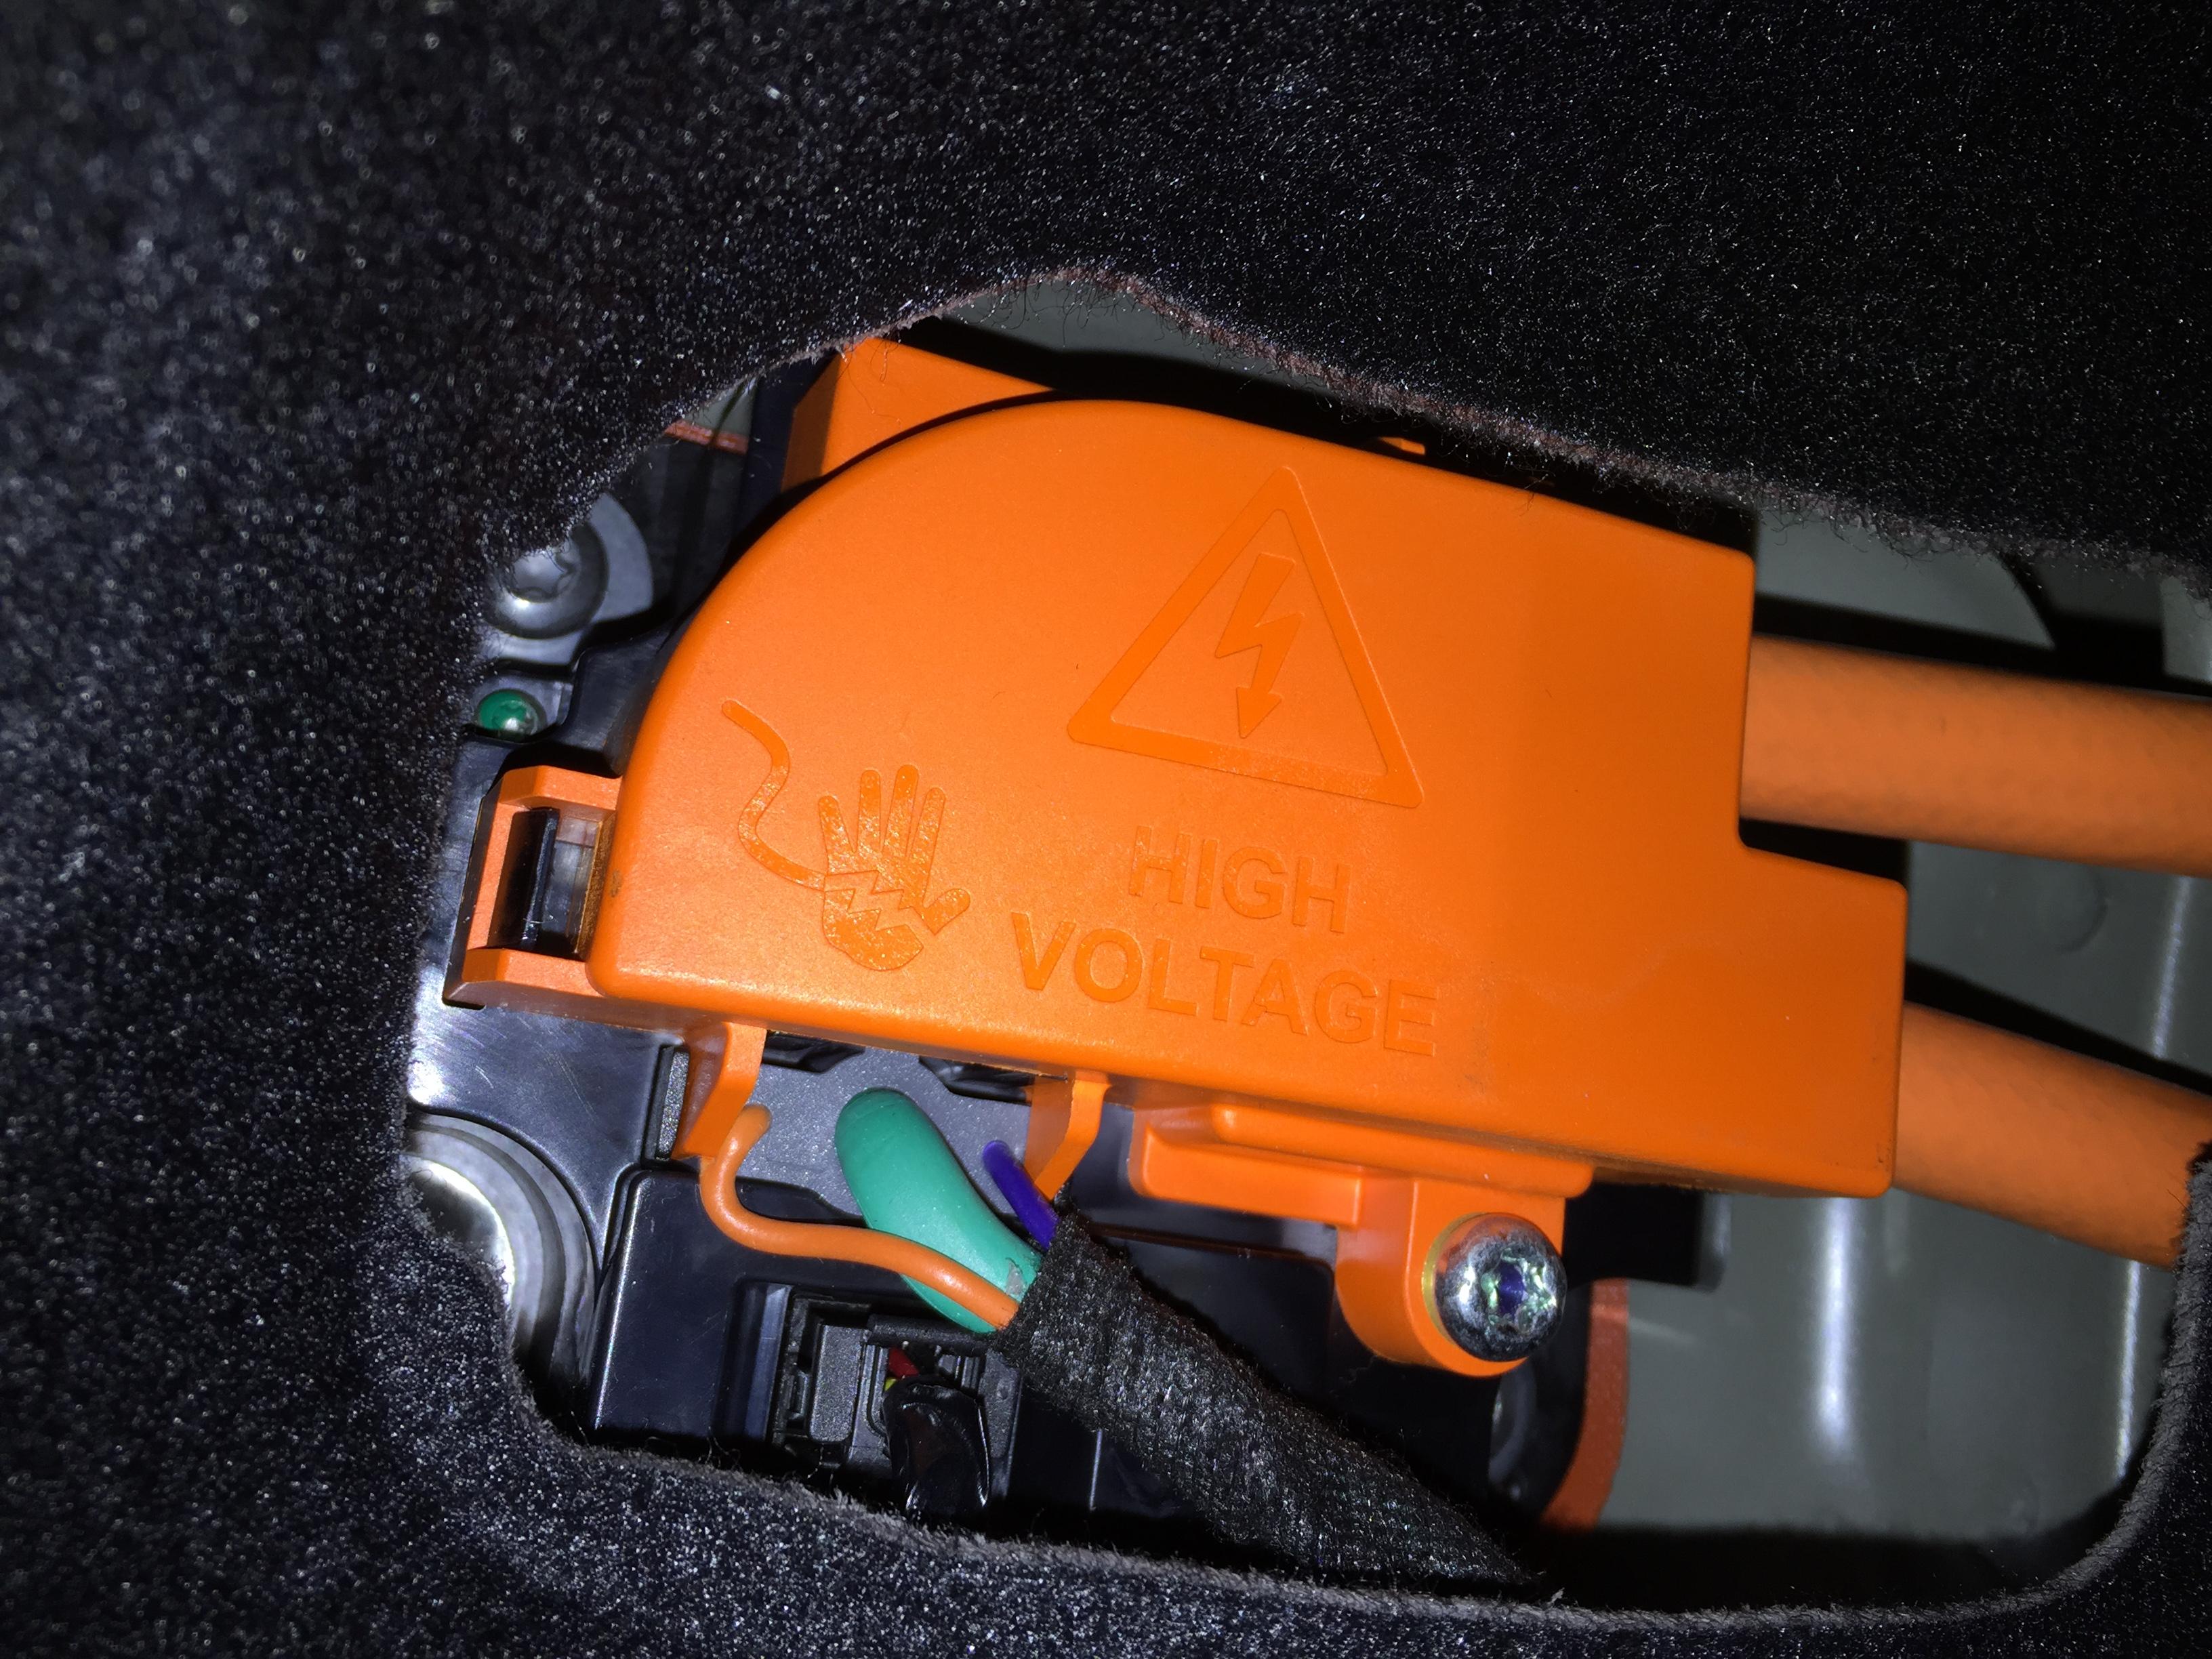 charge port.JPG